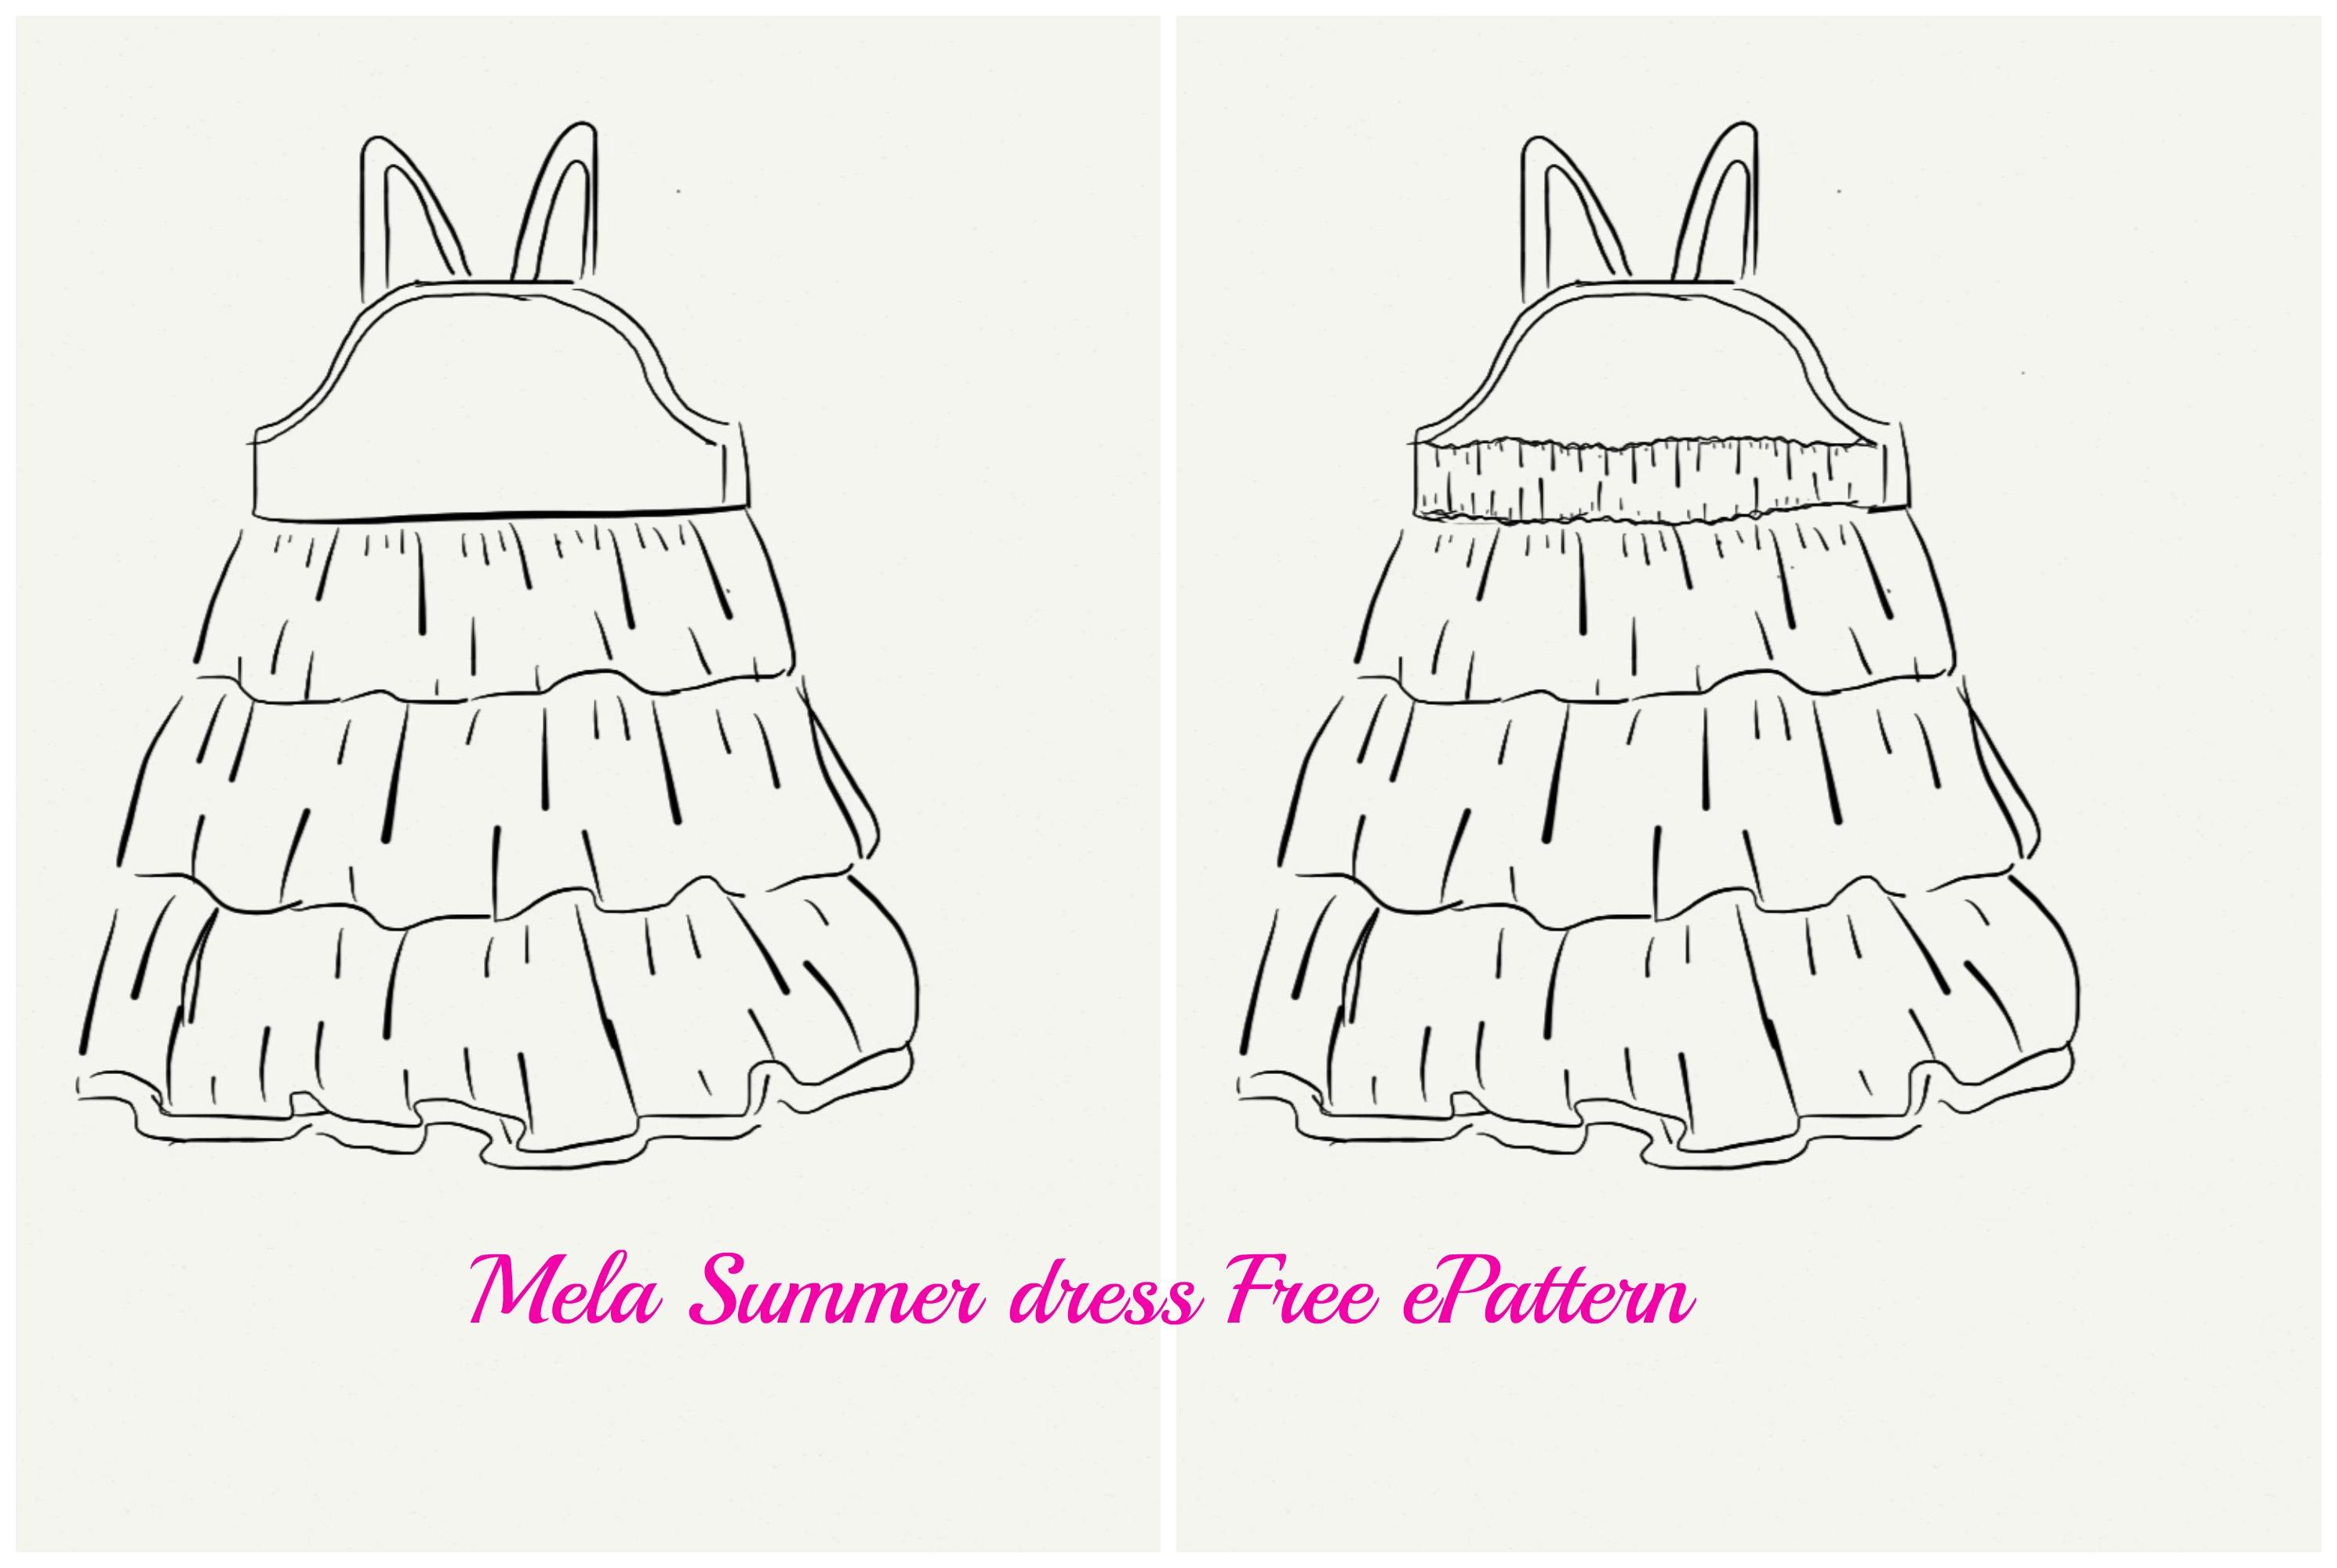 Mela Summer Dress Free E-Pattern